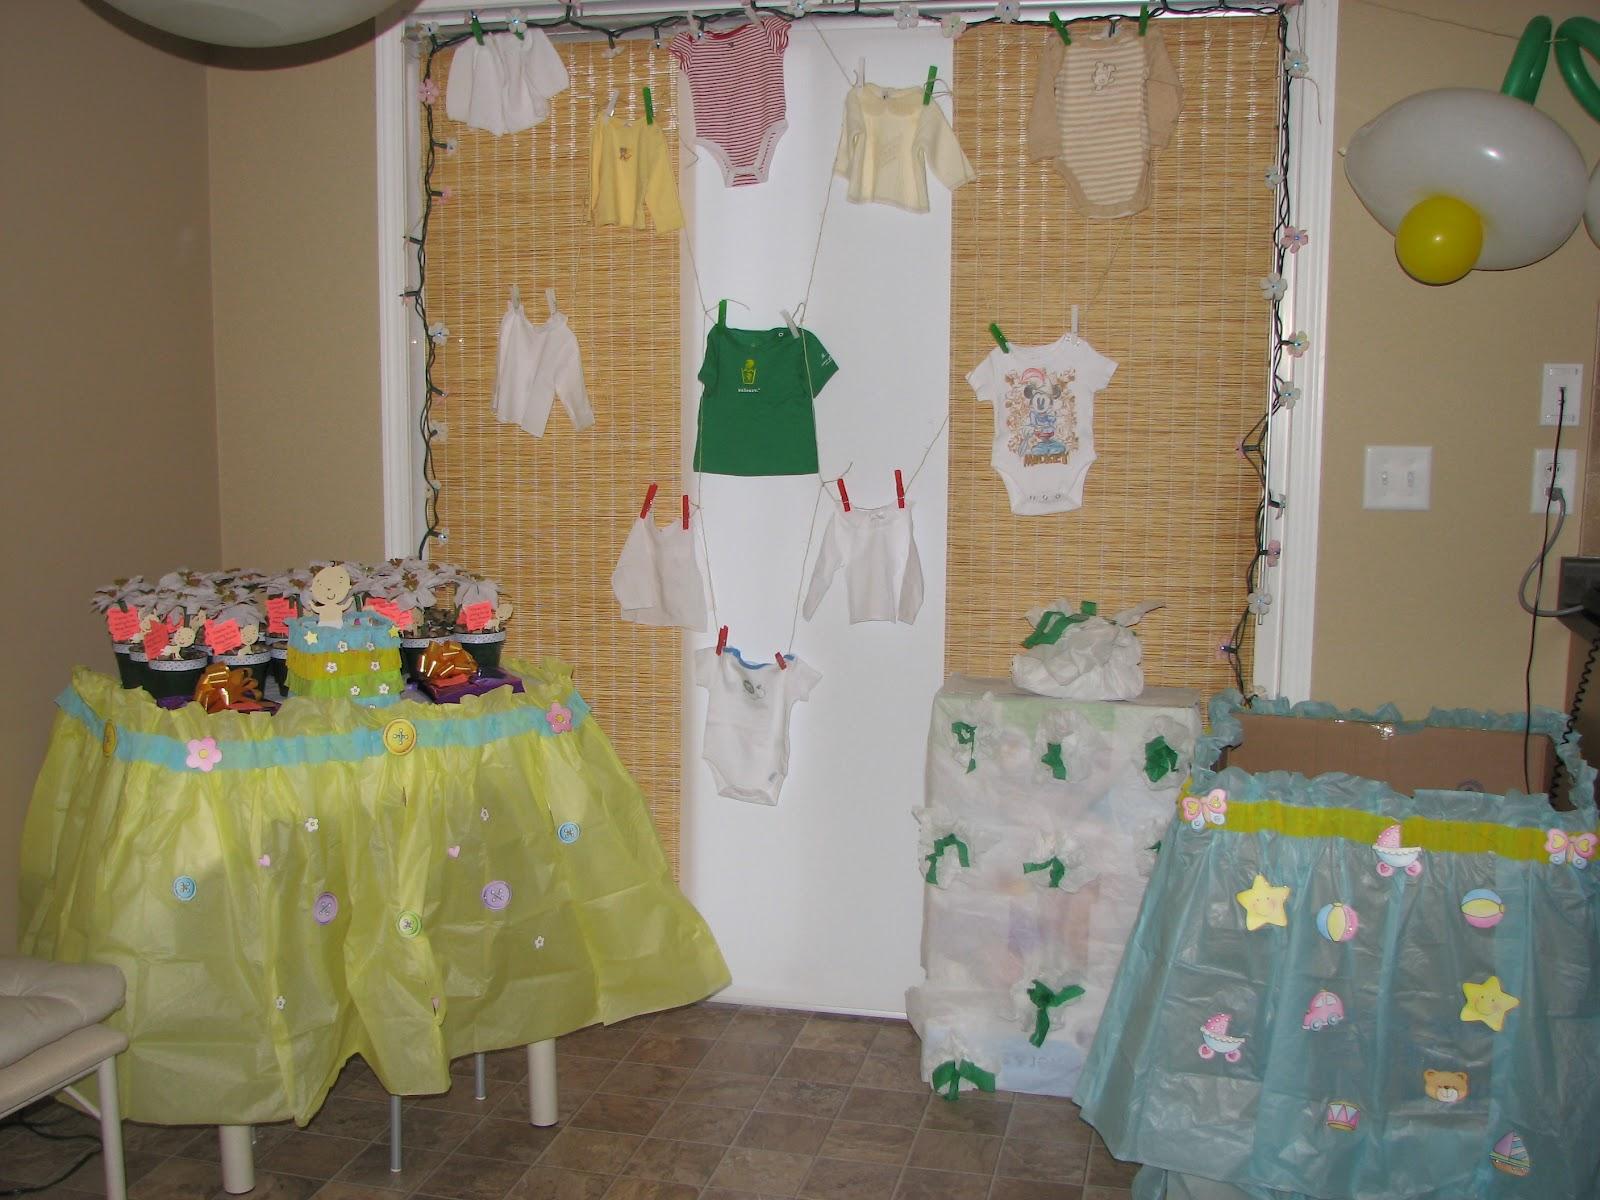 Baby shower party decor baby shower party decor baby shower